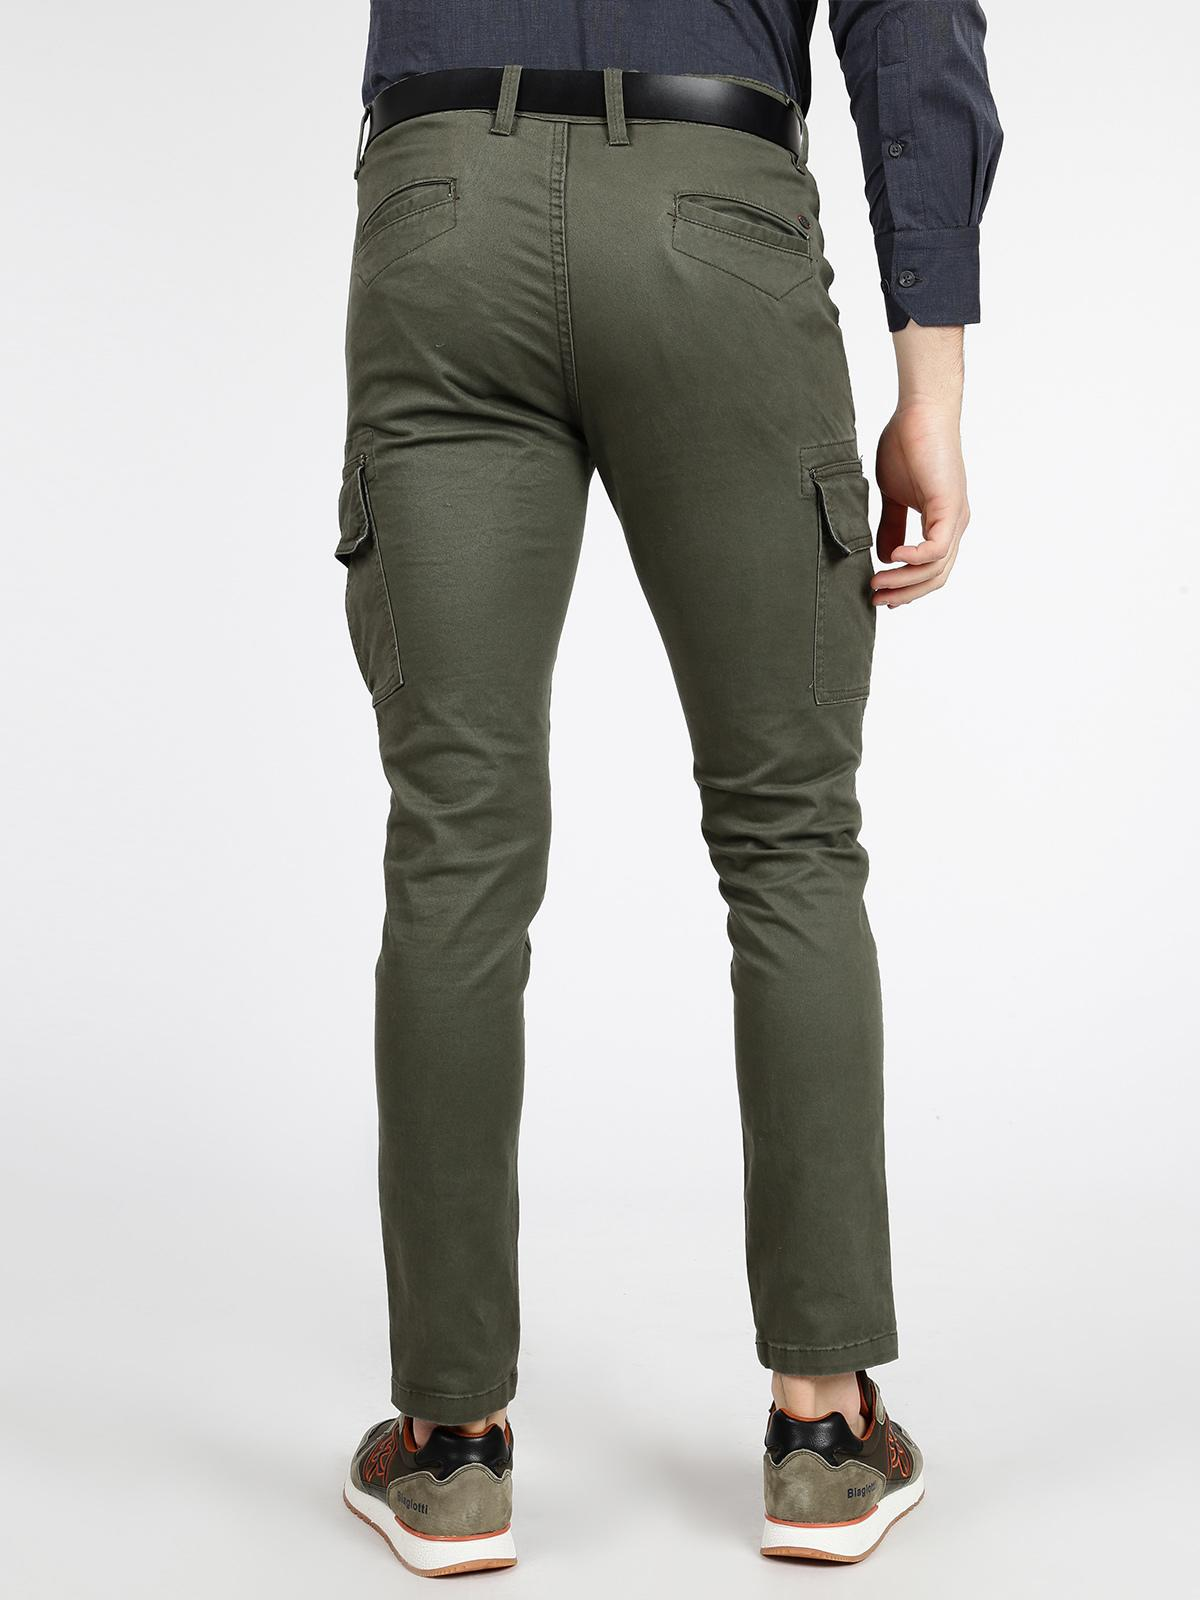 vari colori 7f93a da934 Pantaloni cargo di cotone guy | MecShopping